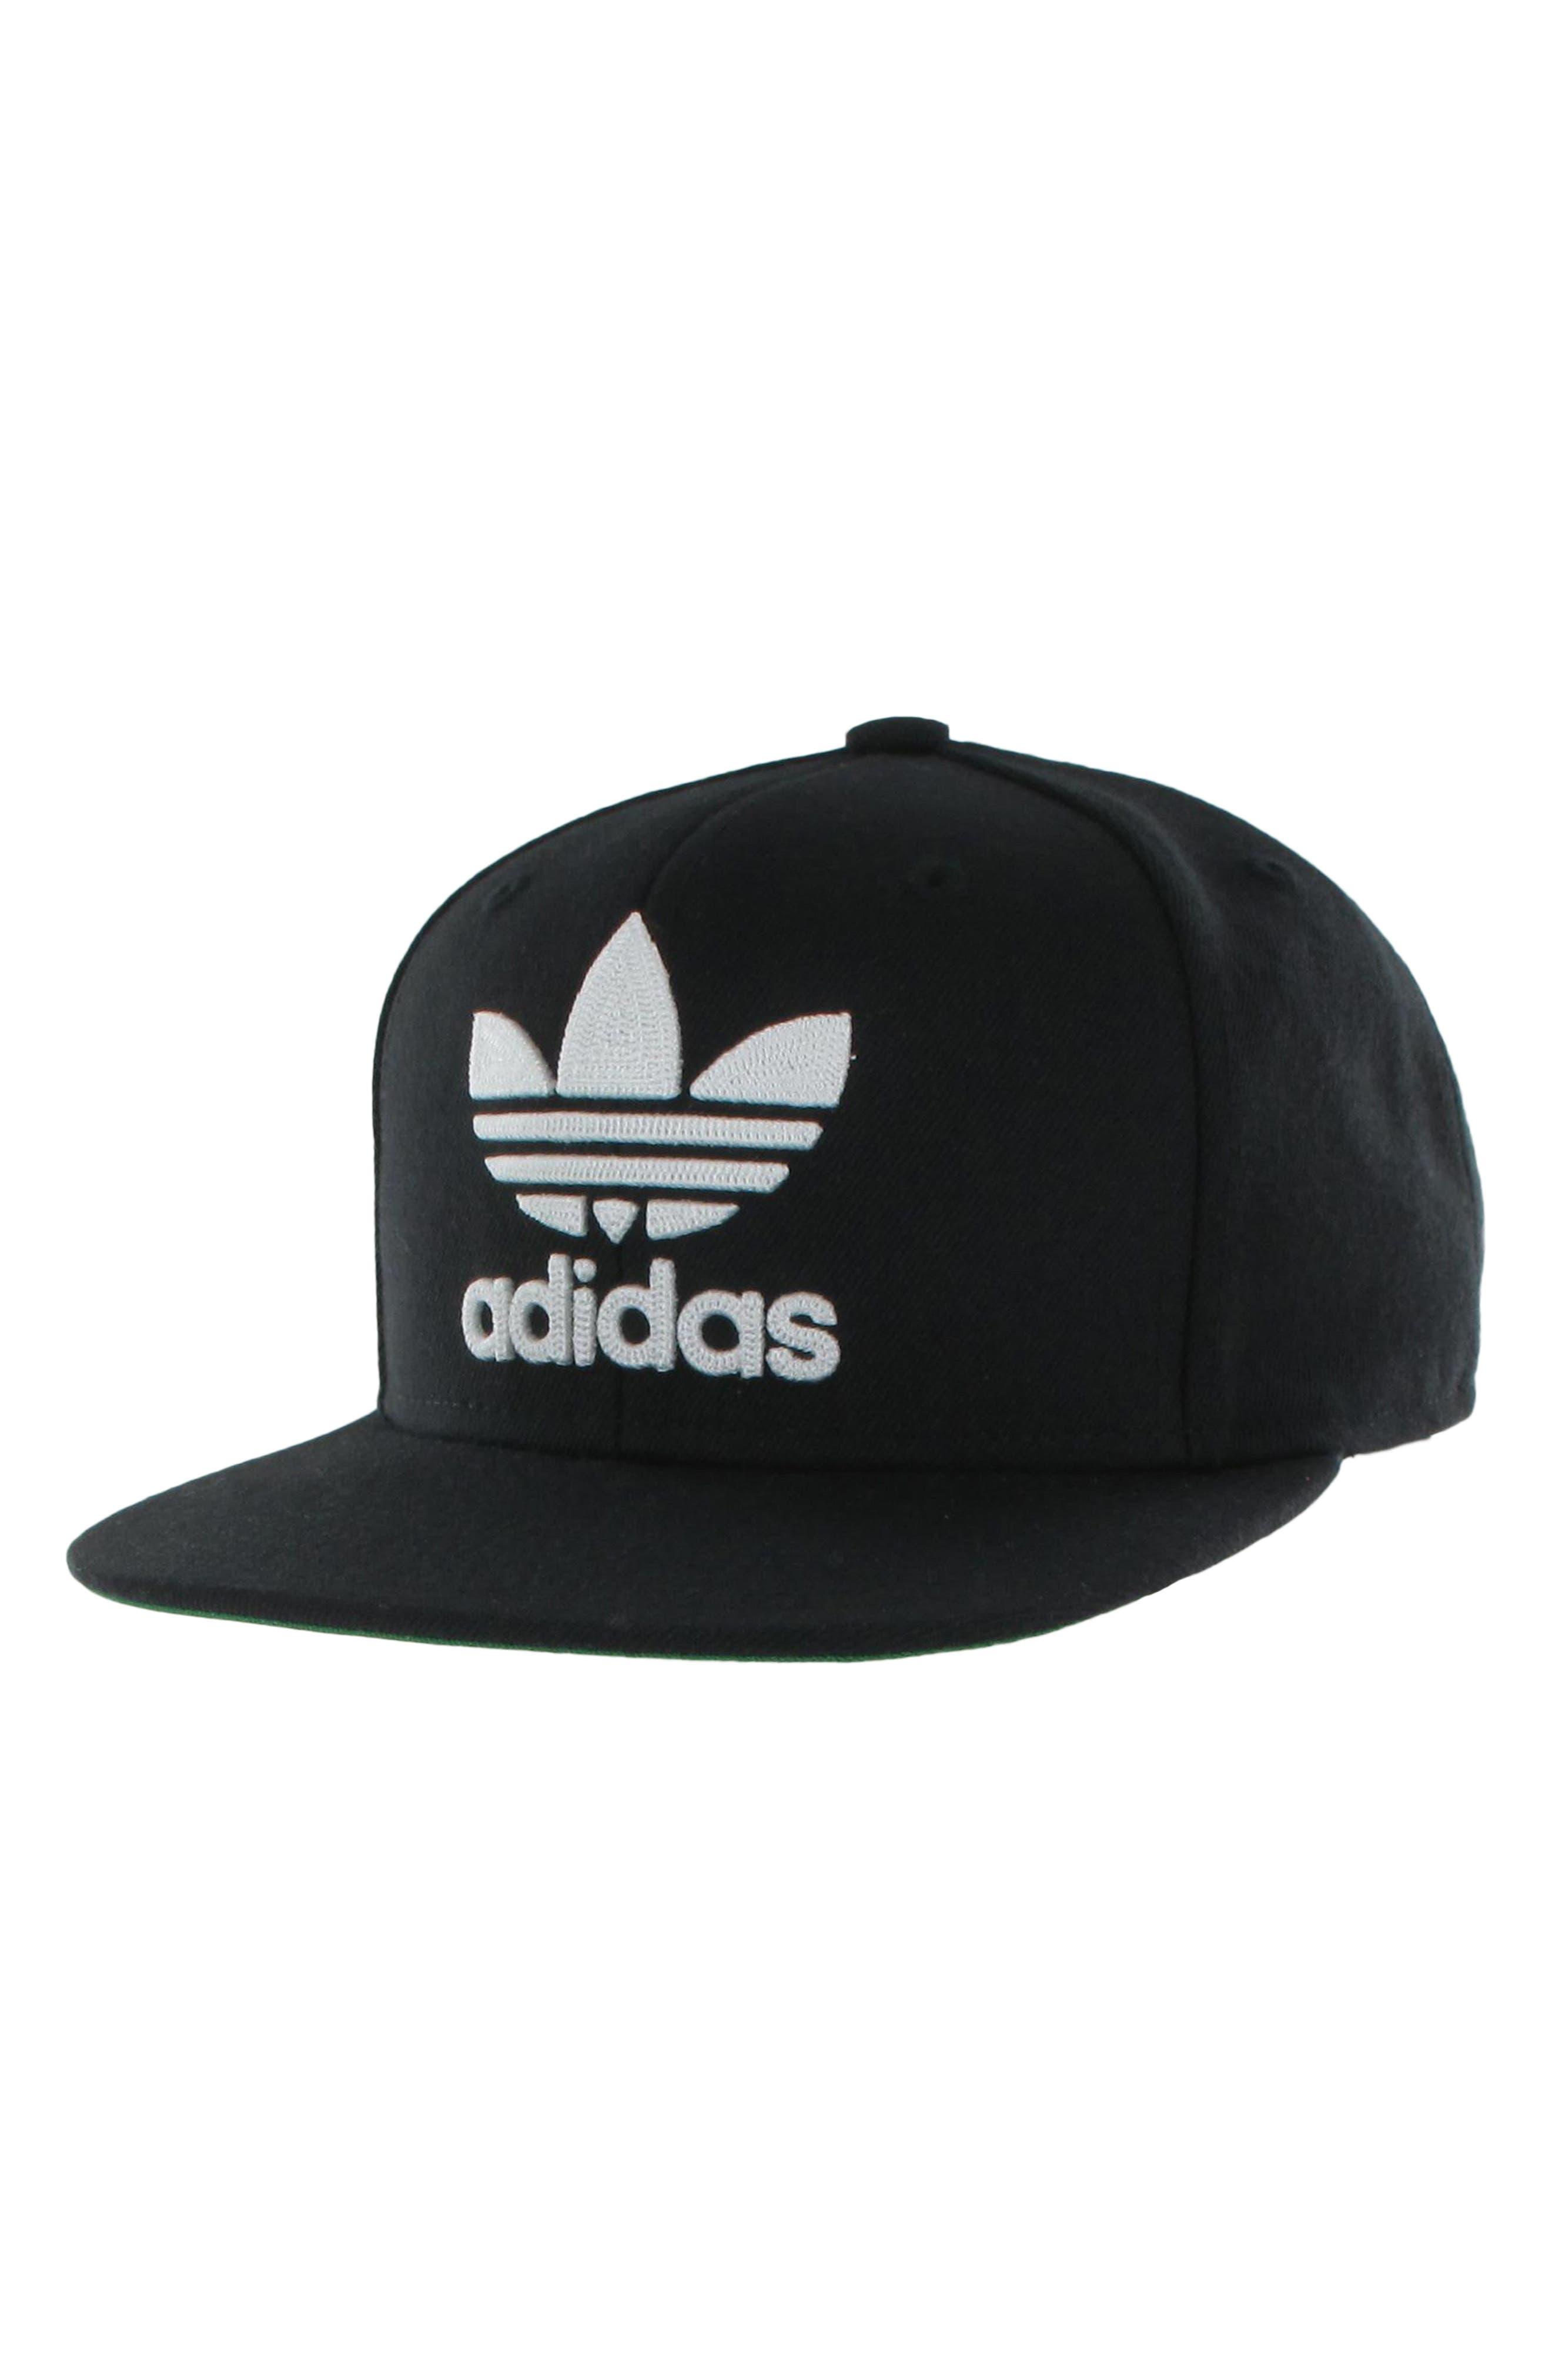 Originals Snapback Hat,                             Main thumbnail 1, color,                             BLACK/ WHITE